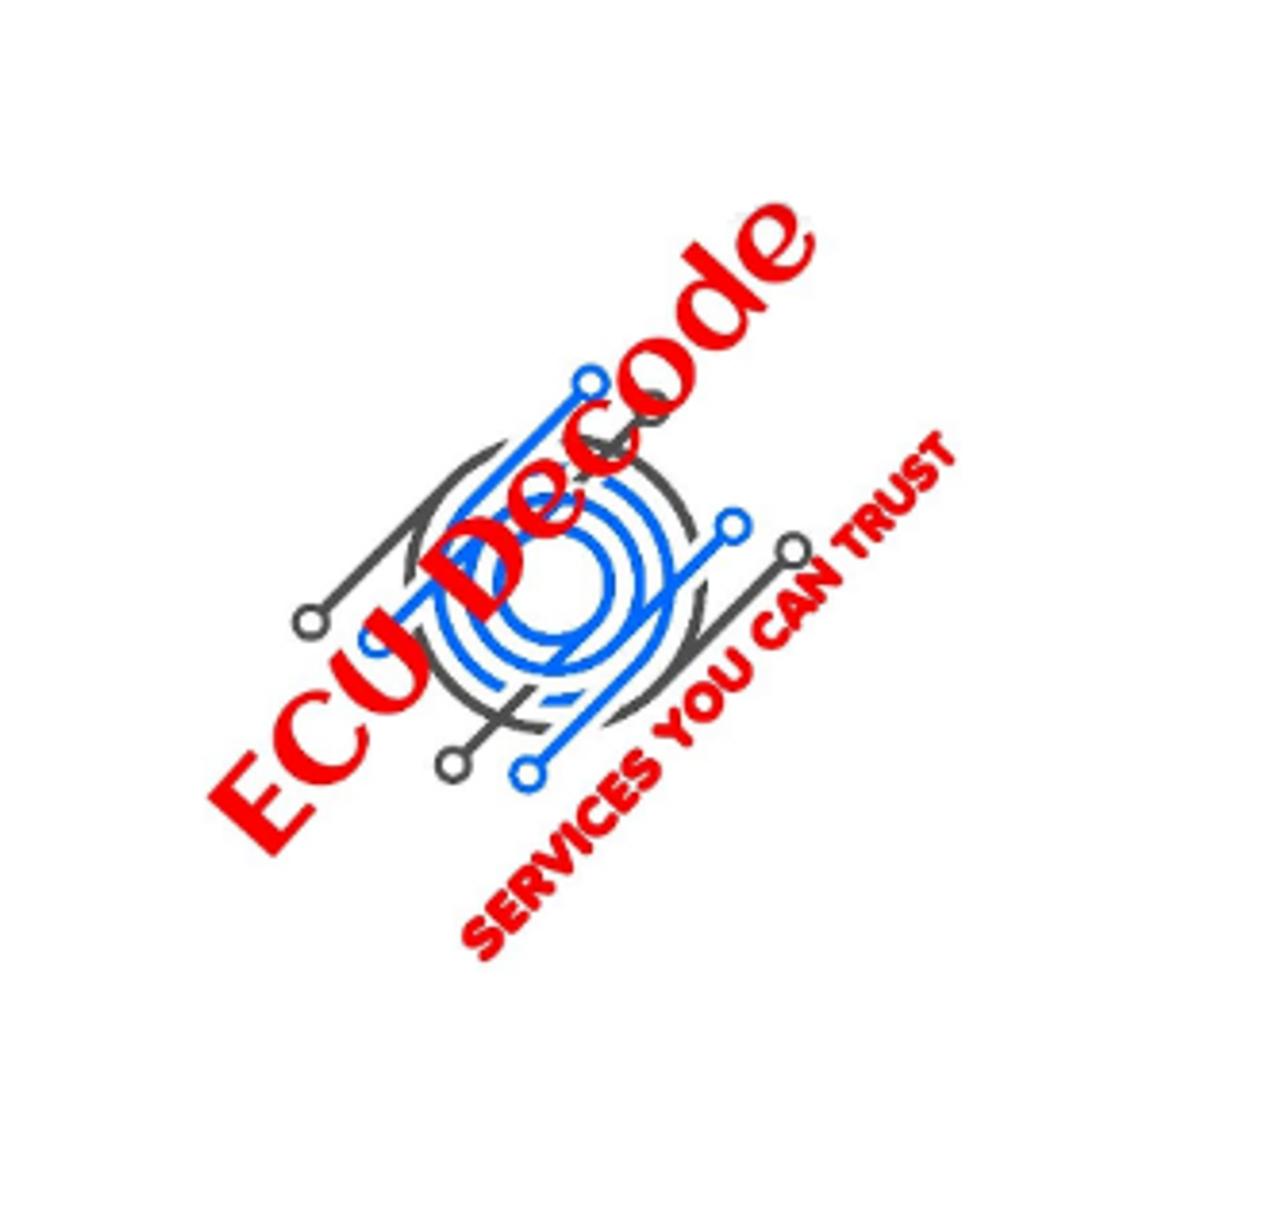 Crossfire Immobiliser Off   Crossfire Immobiliser Bypass   Crossfire Immobiliser Repairs   Crossfire ME2.8 Unlock From ECU Decode Limited